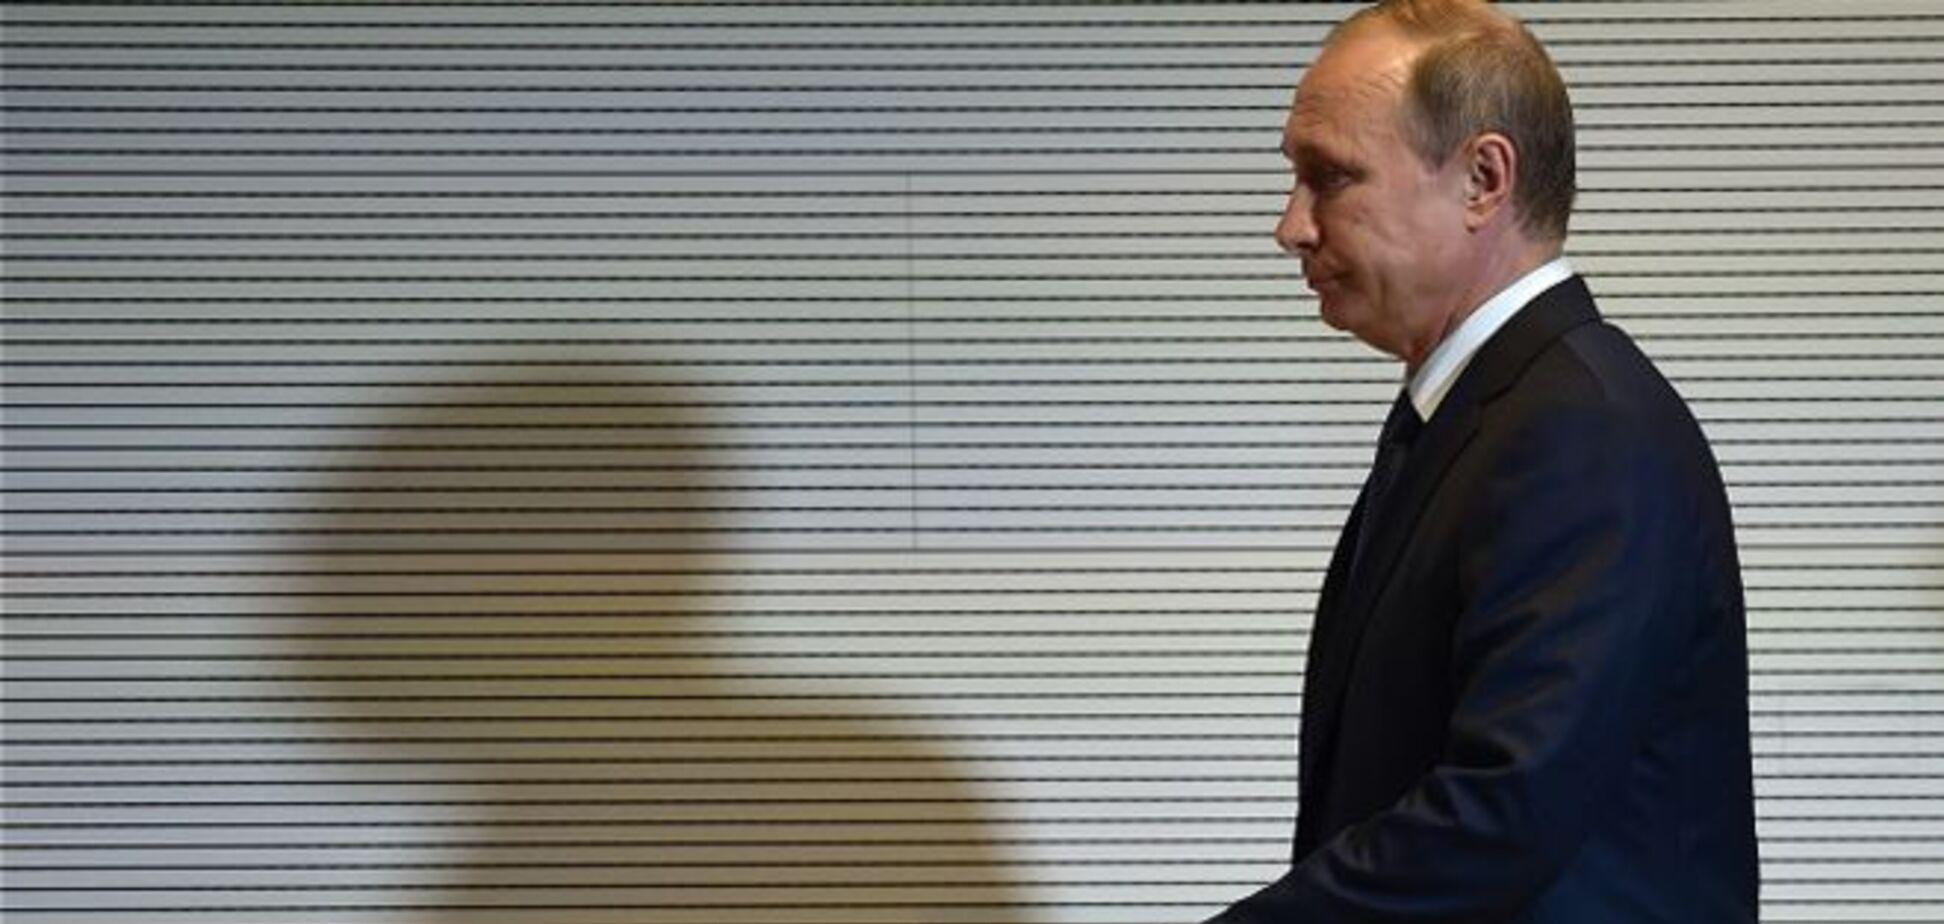 Судьба неумолима: Путин уйдет с поста президента